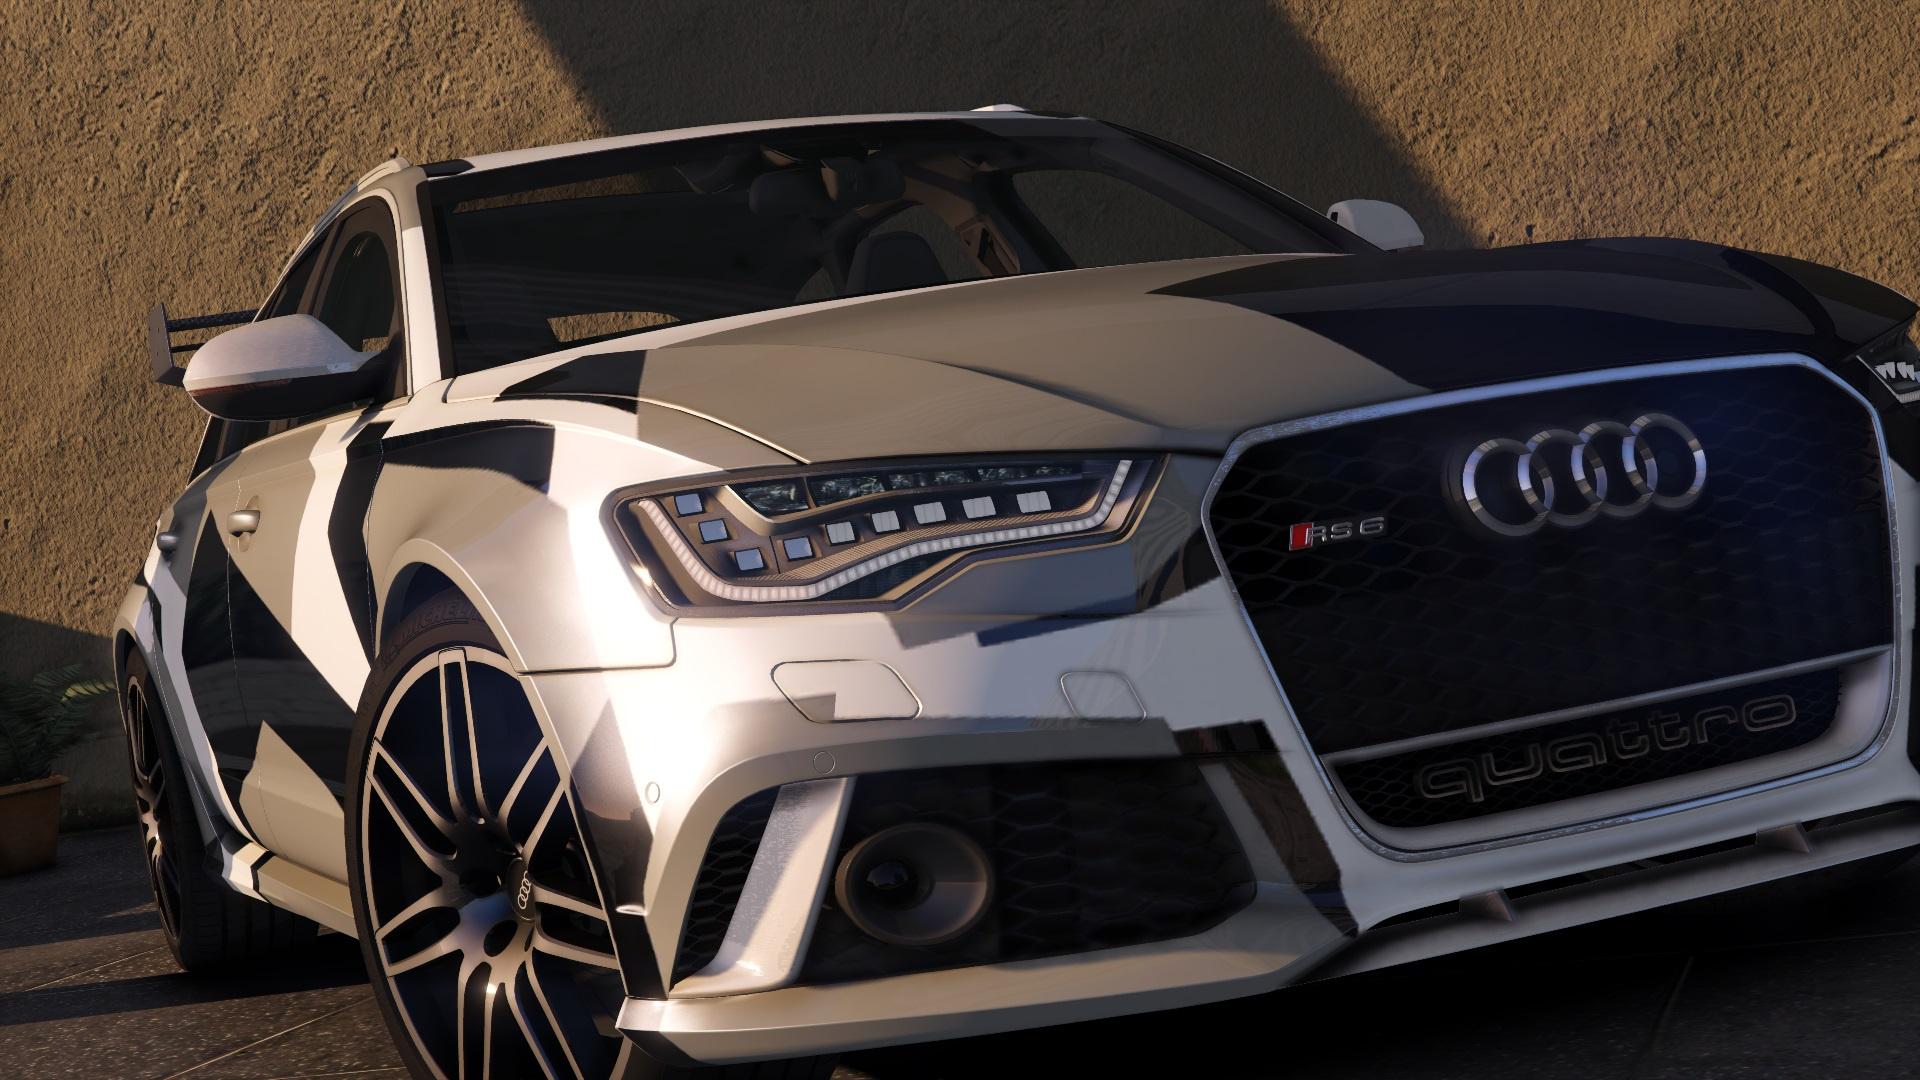 39a5bc grand theft auto v screenshot 2017.11.28   00.15.33.07